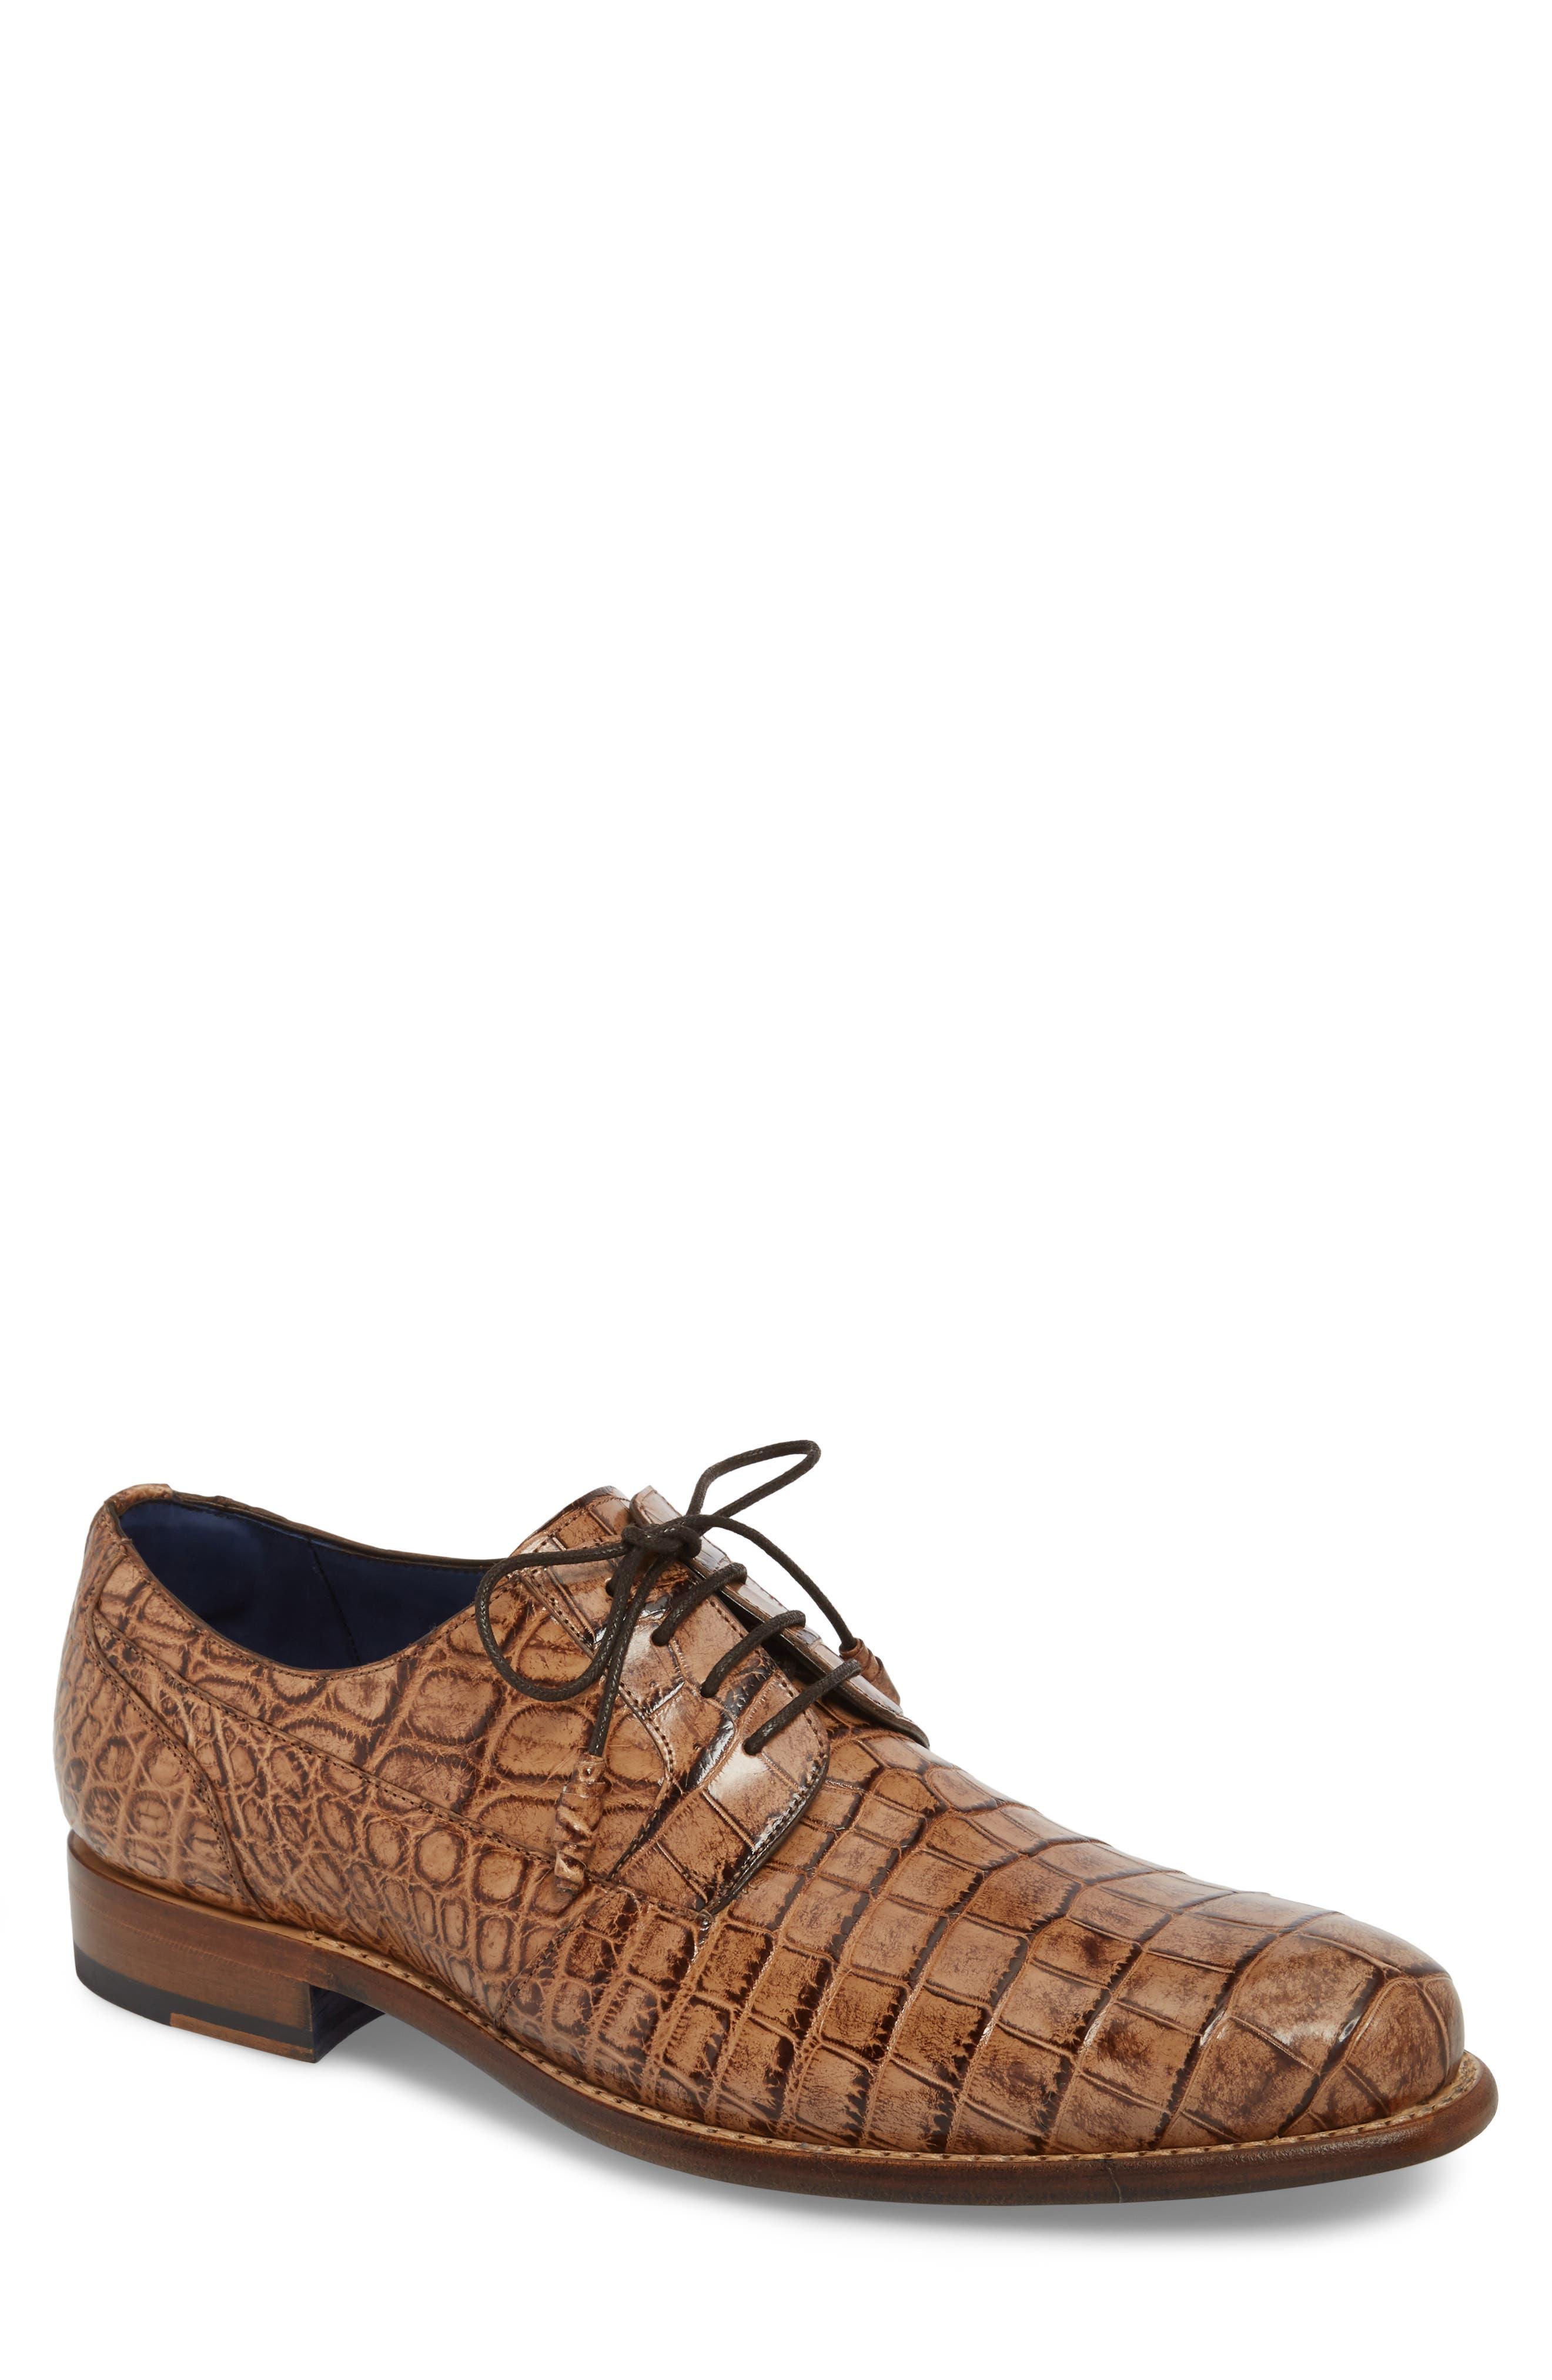 Hercules Plain Toe Derby,                         Main,                         color, Beige/ Brown